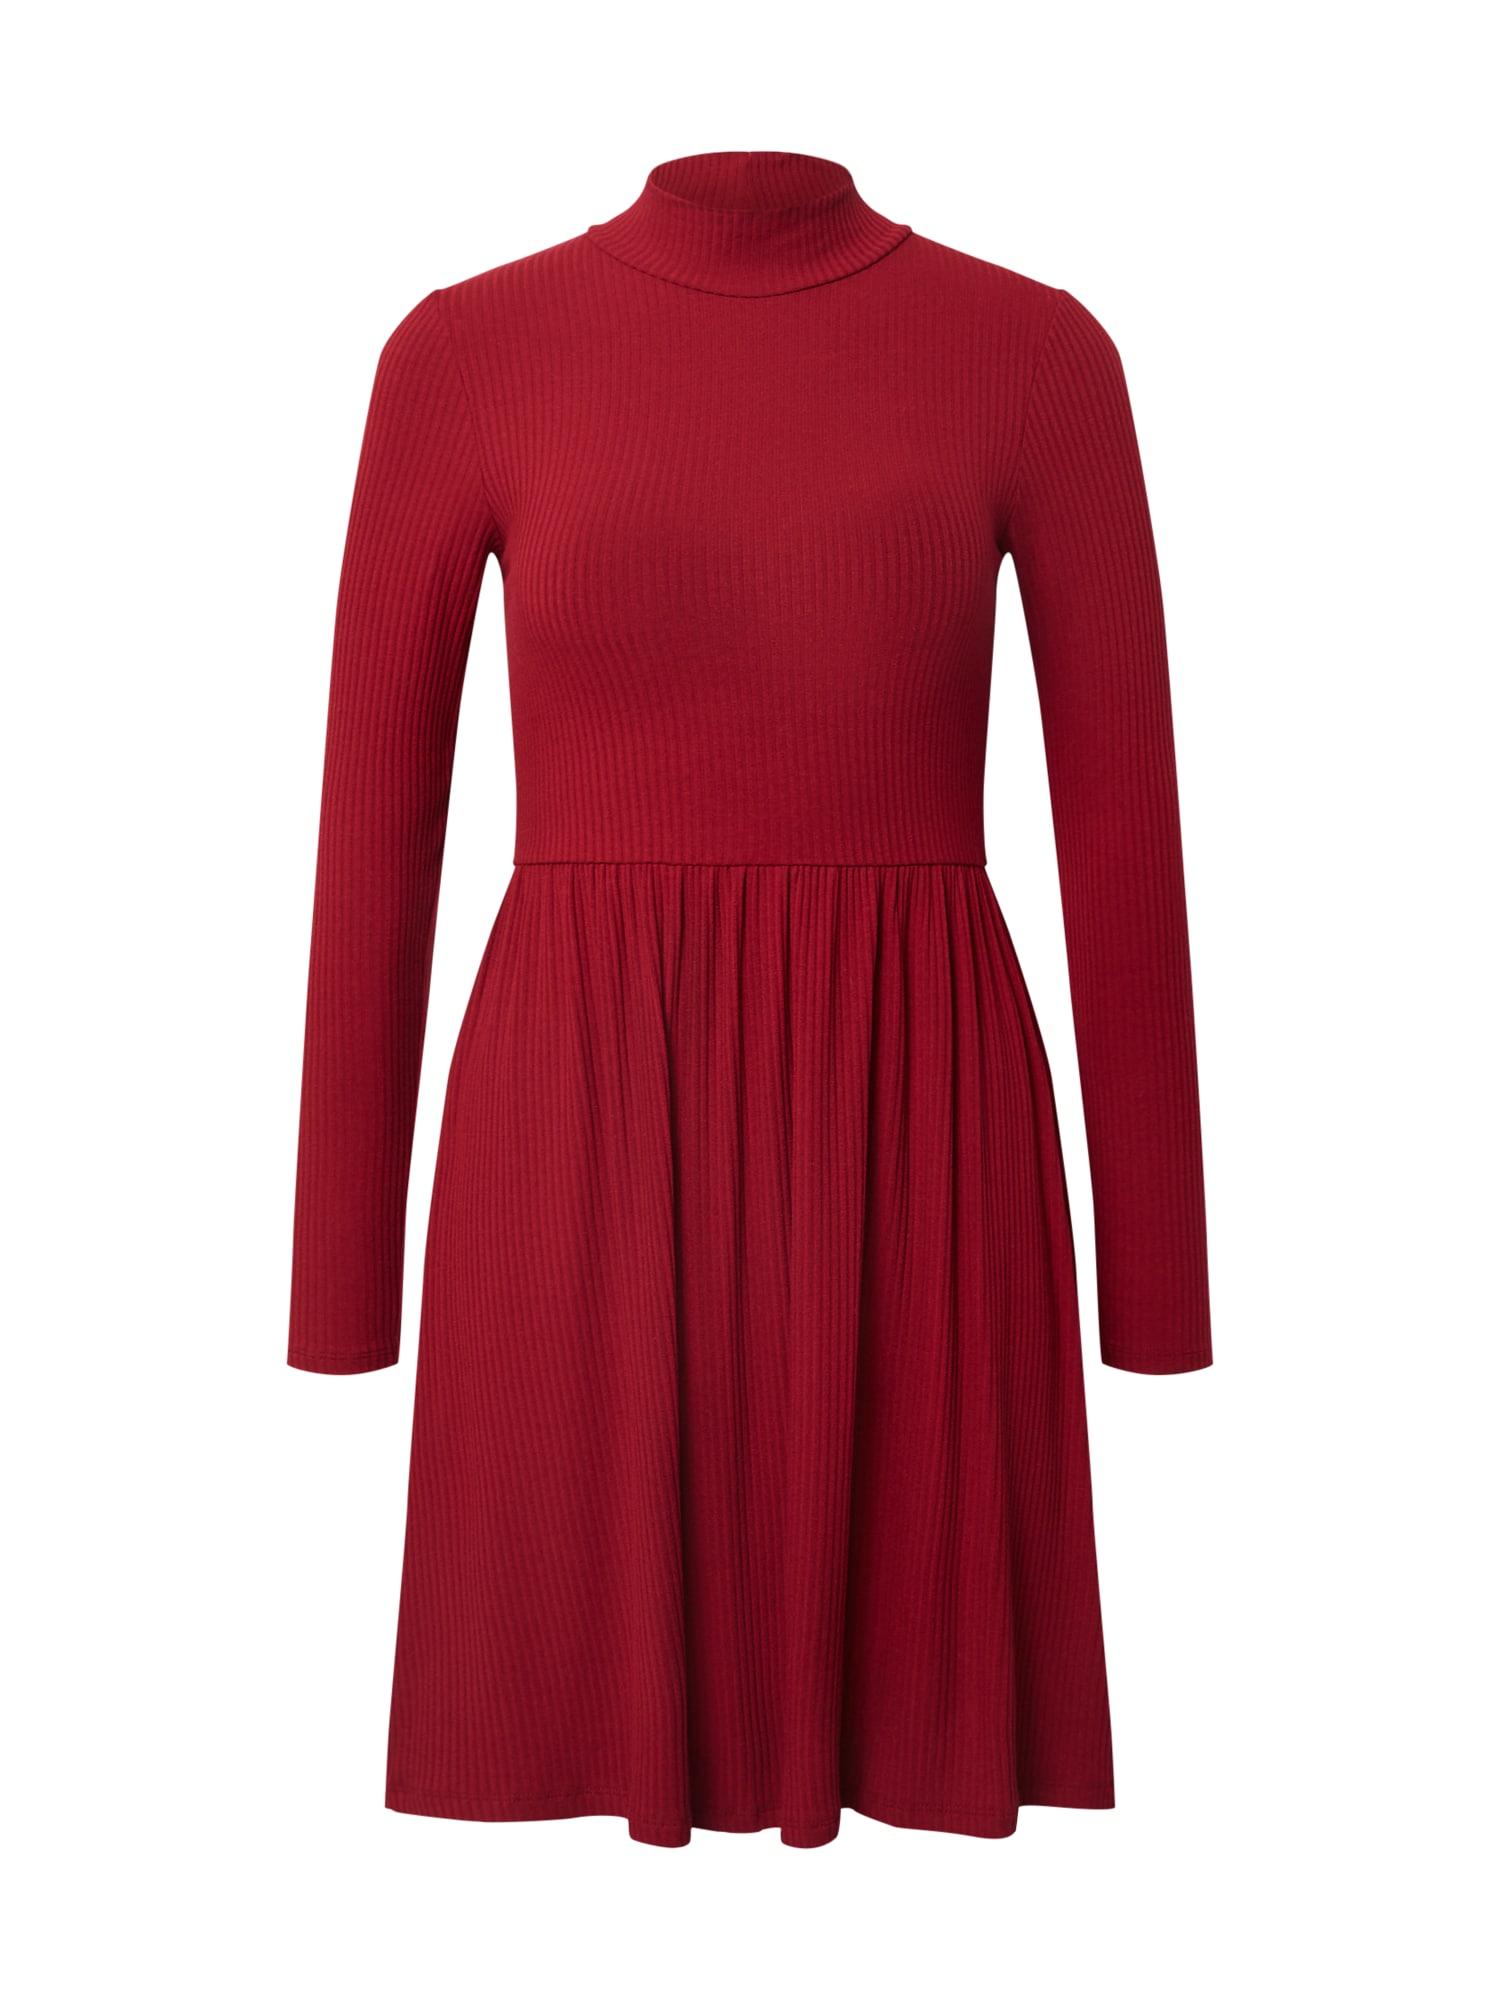 ABOUT YOU Megzta suknelė 'Gwen' raudona